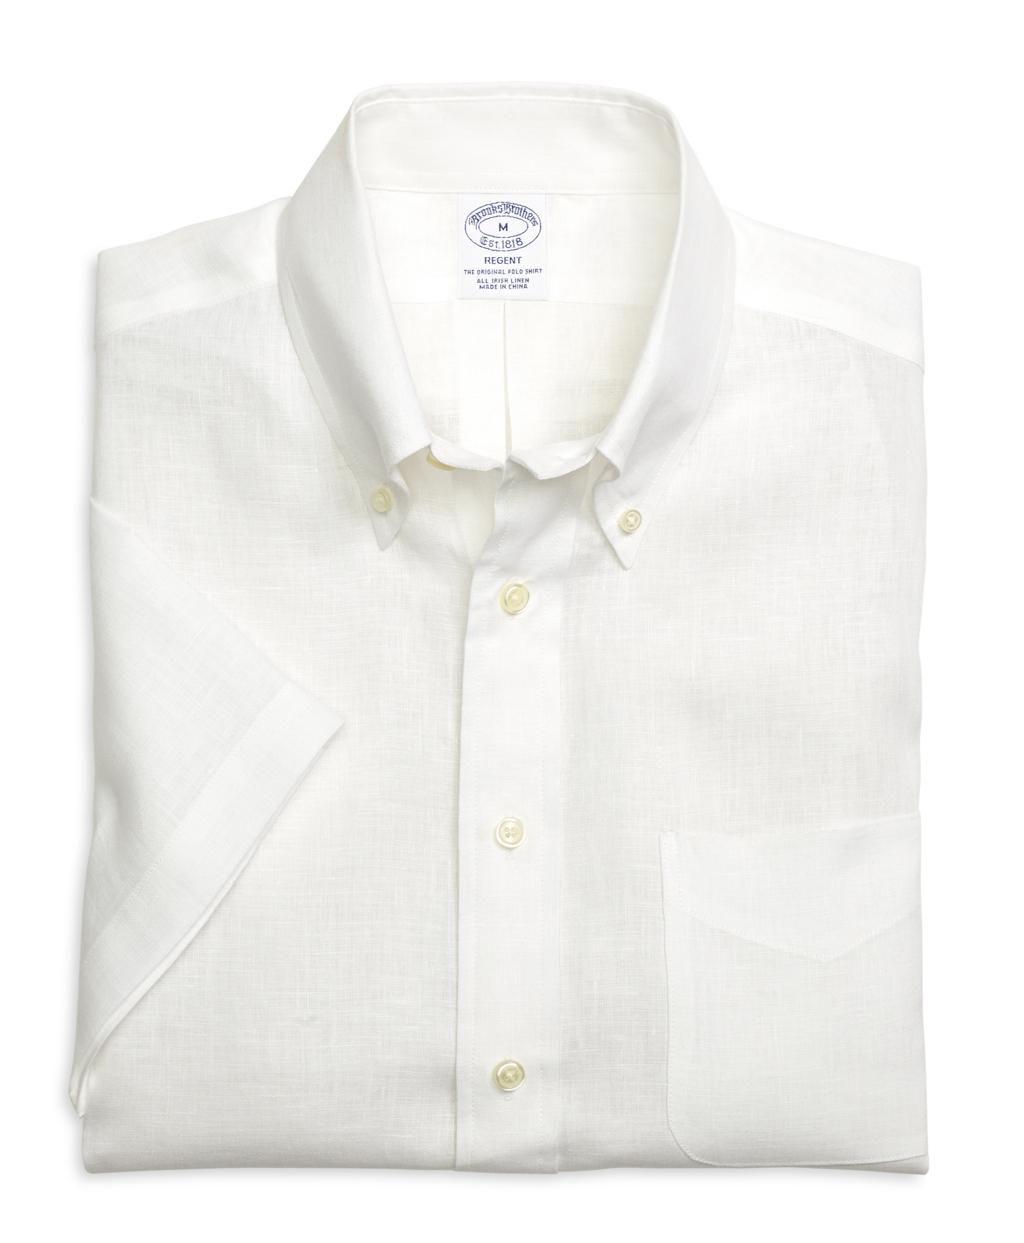 Brooks brothers regent fit linen short sleeve sport shirt for Brooks brothers dress shirt fit guide